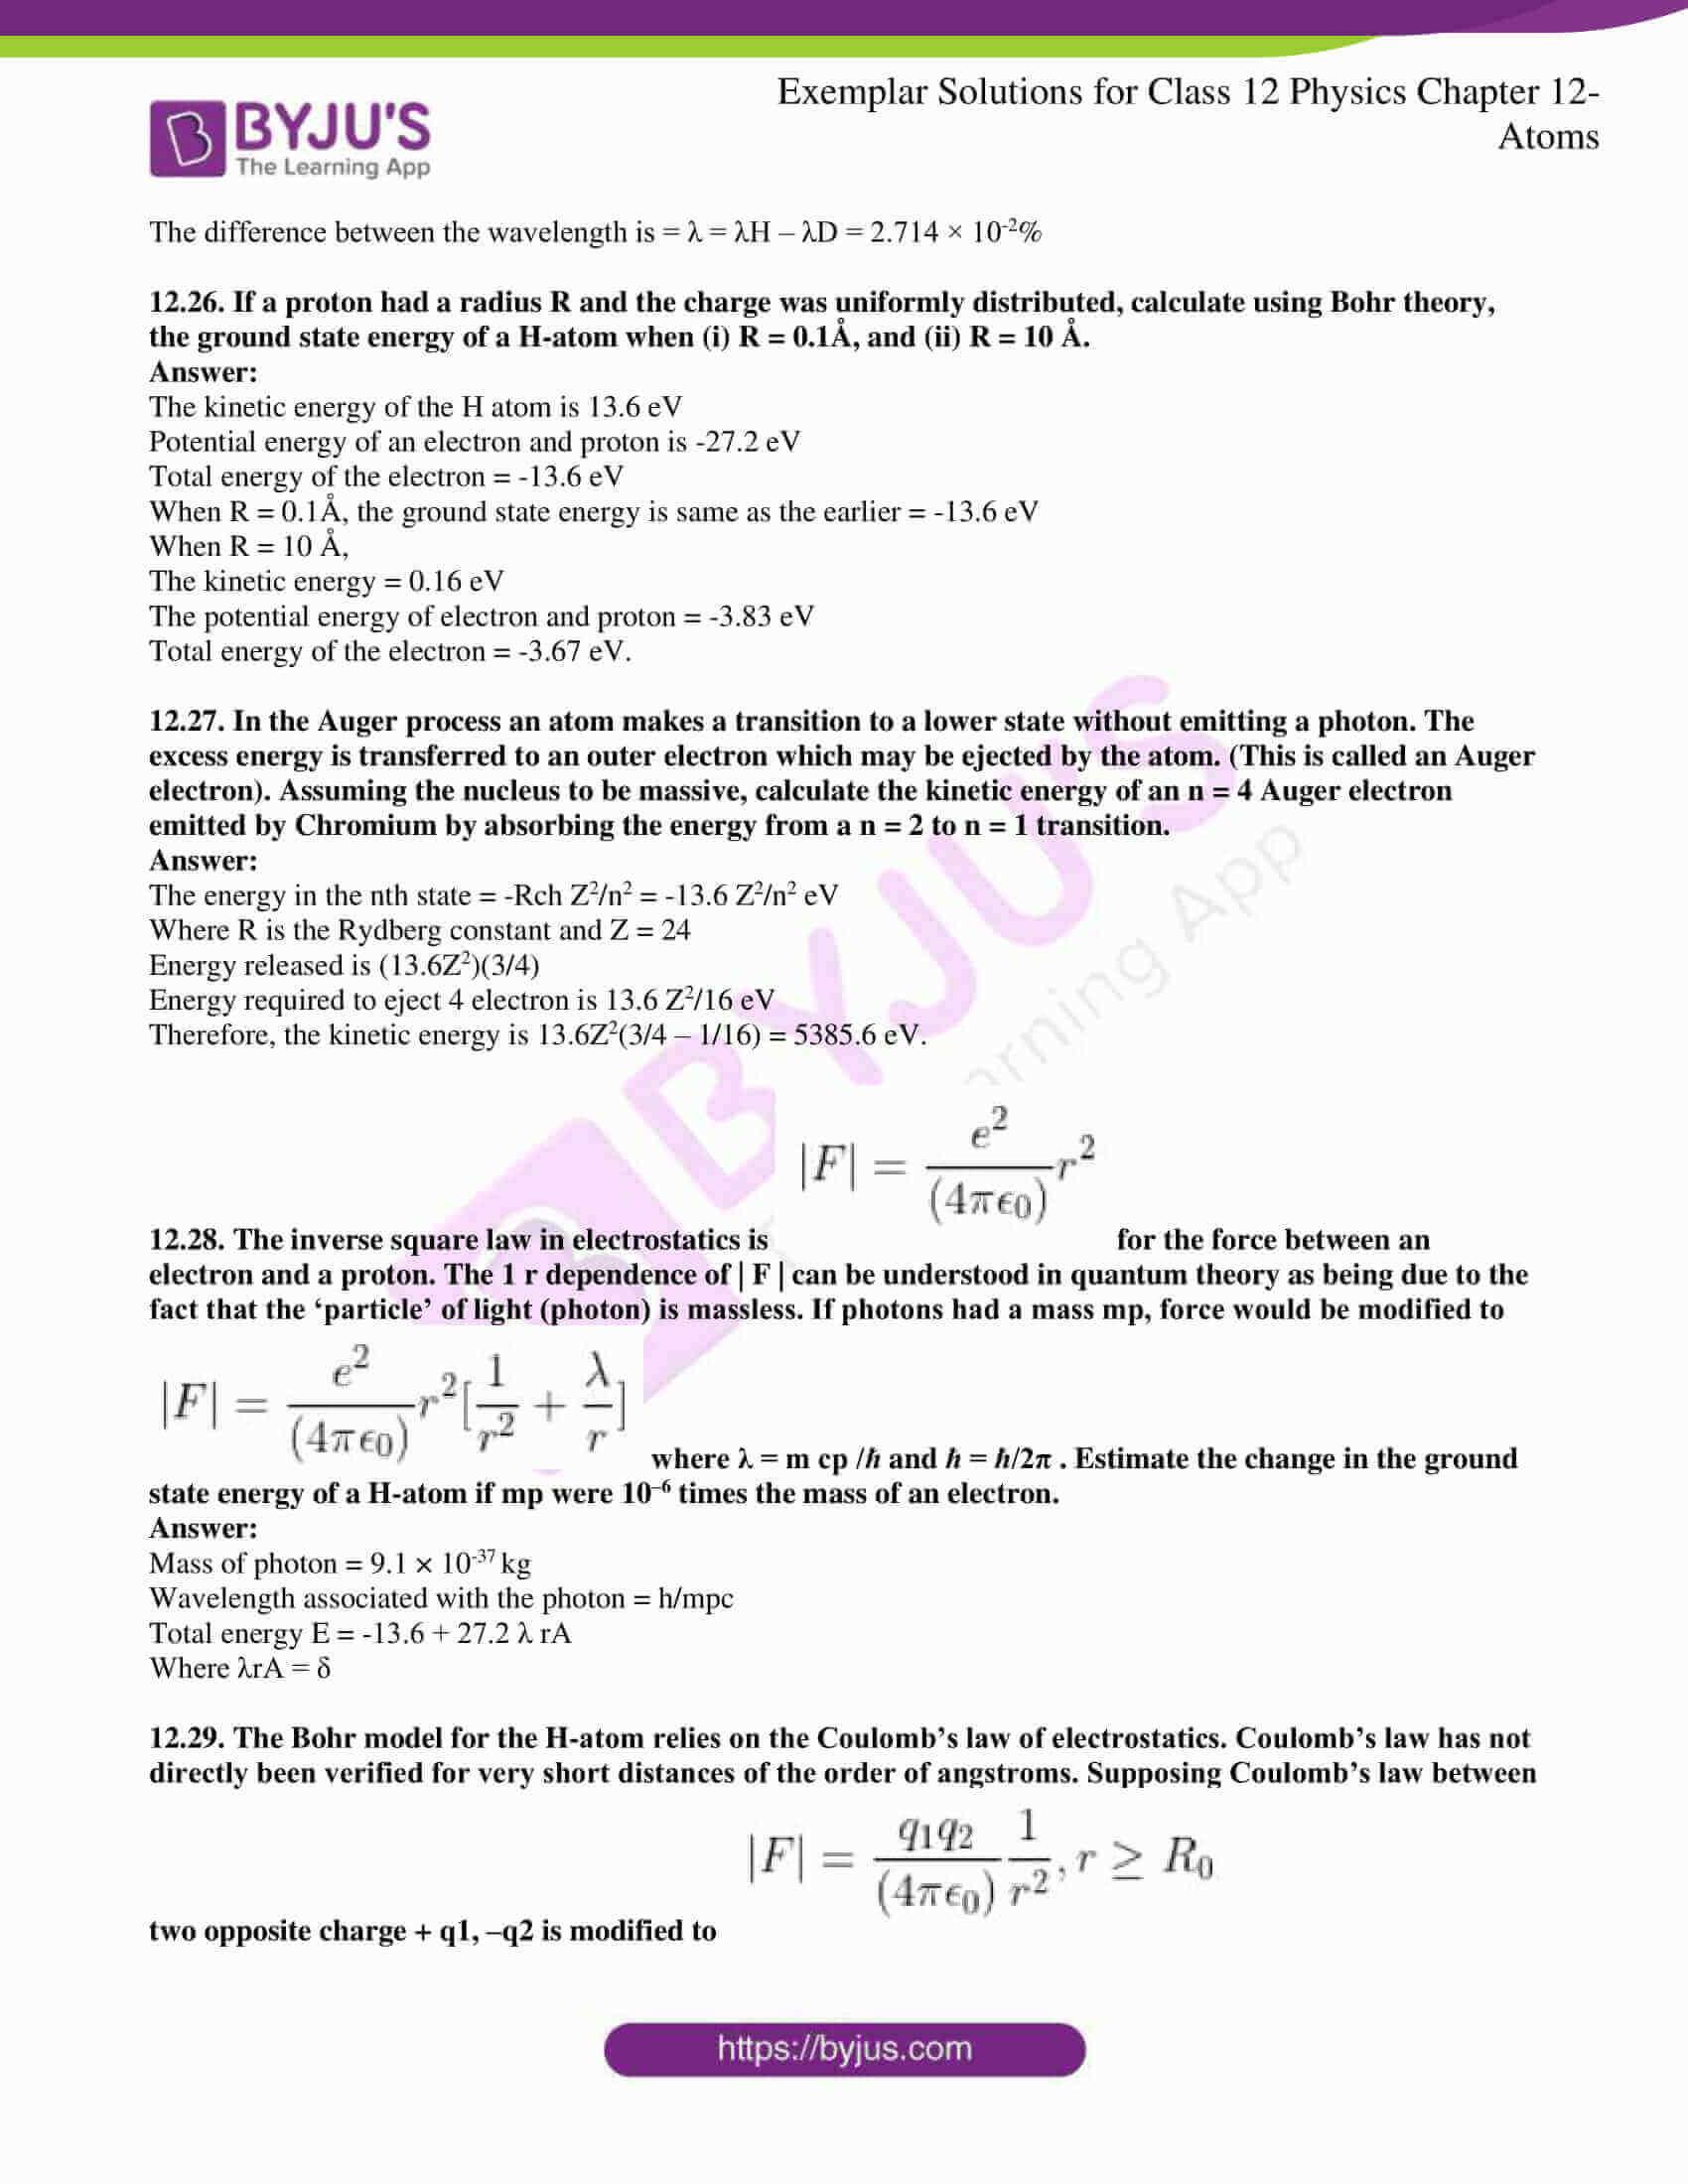 ncert exemplar solutions for class 12 physics chapter 12 6